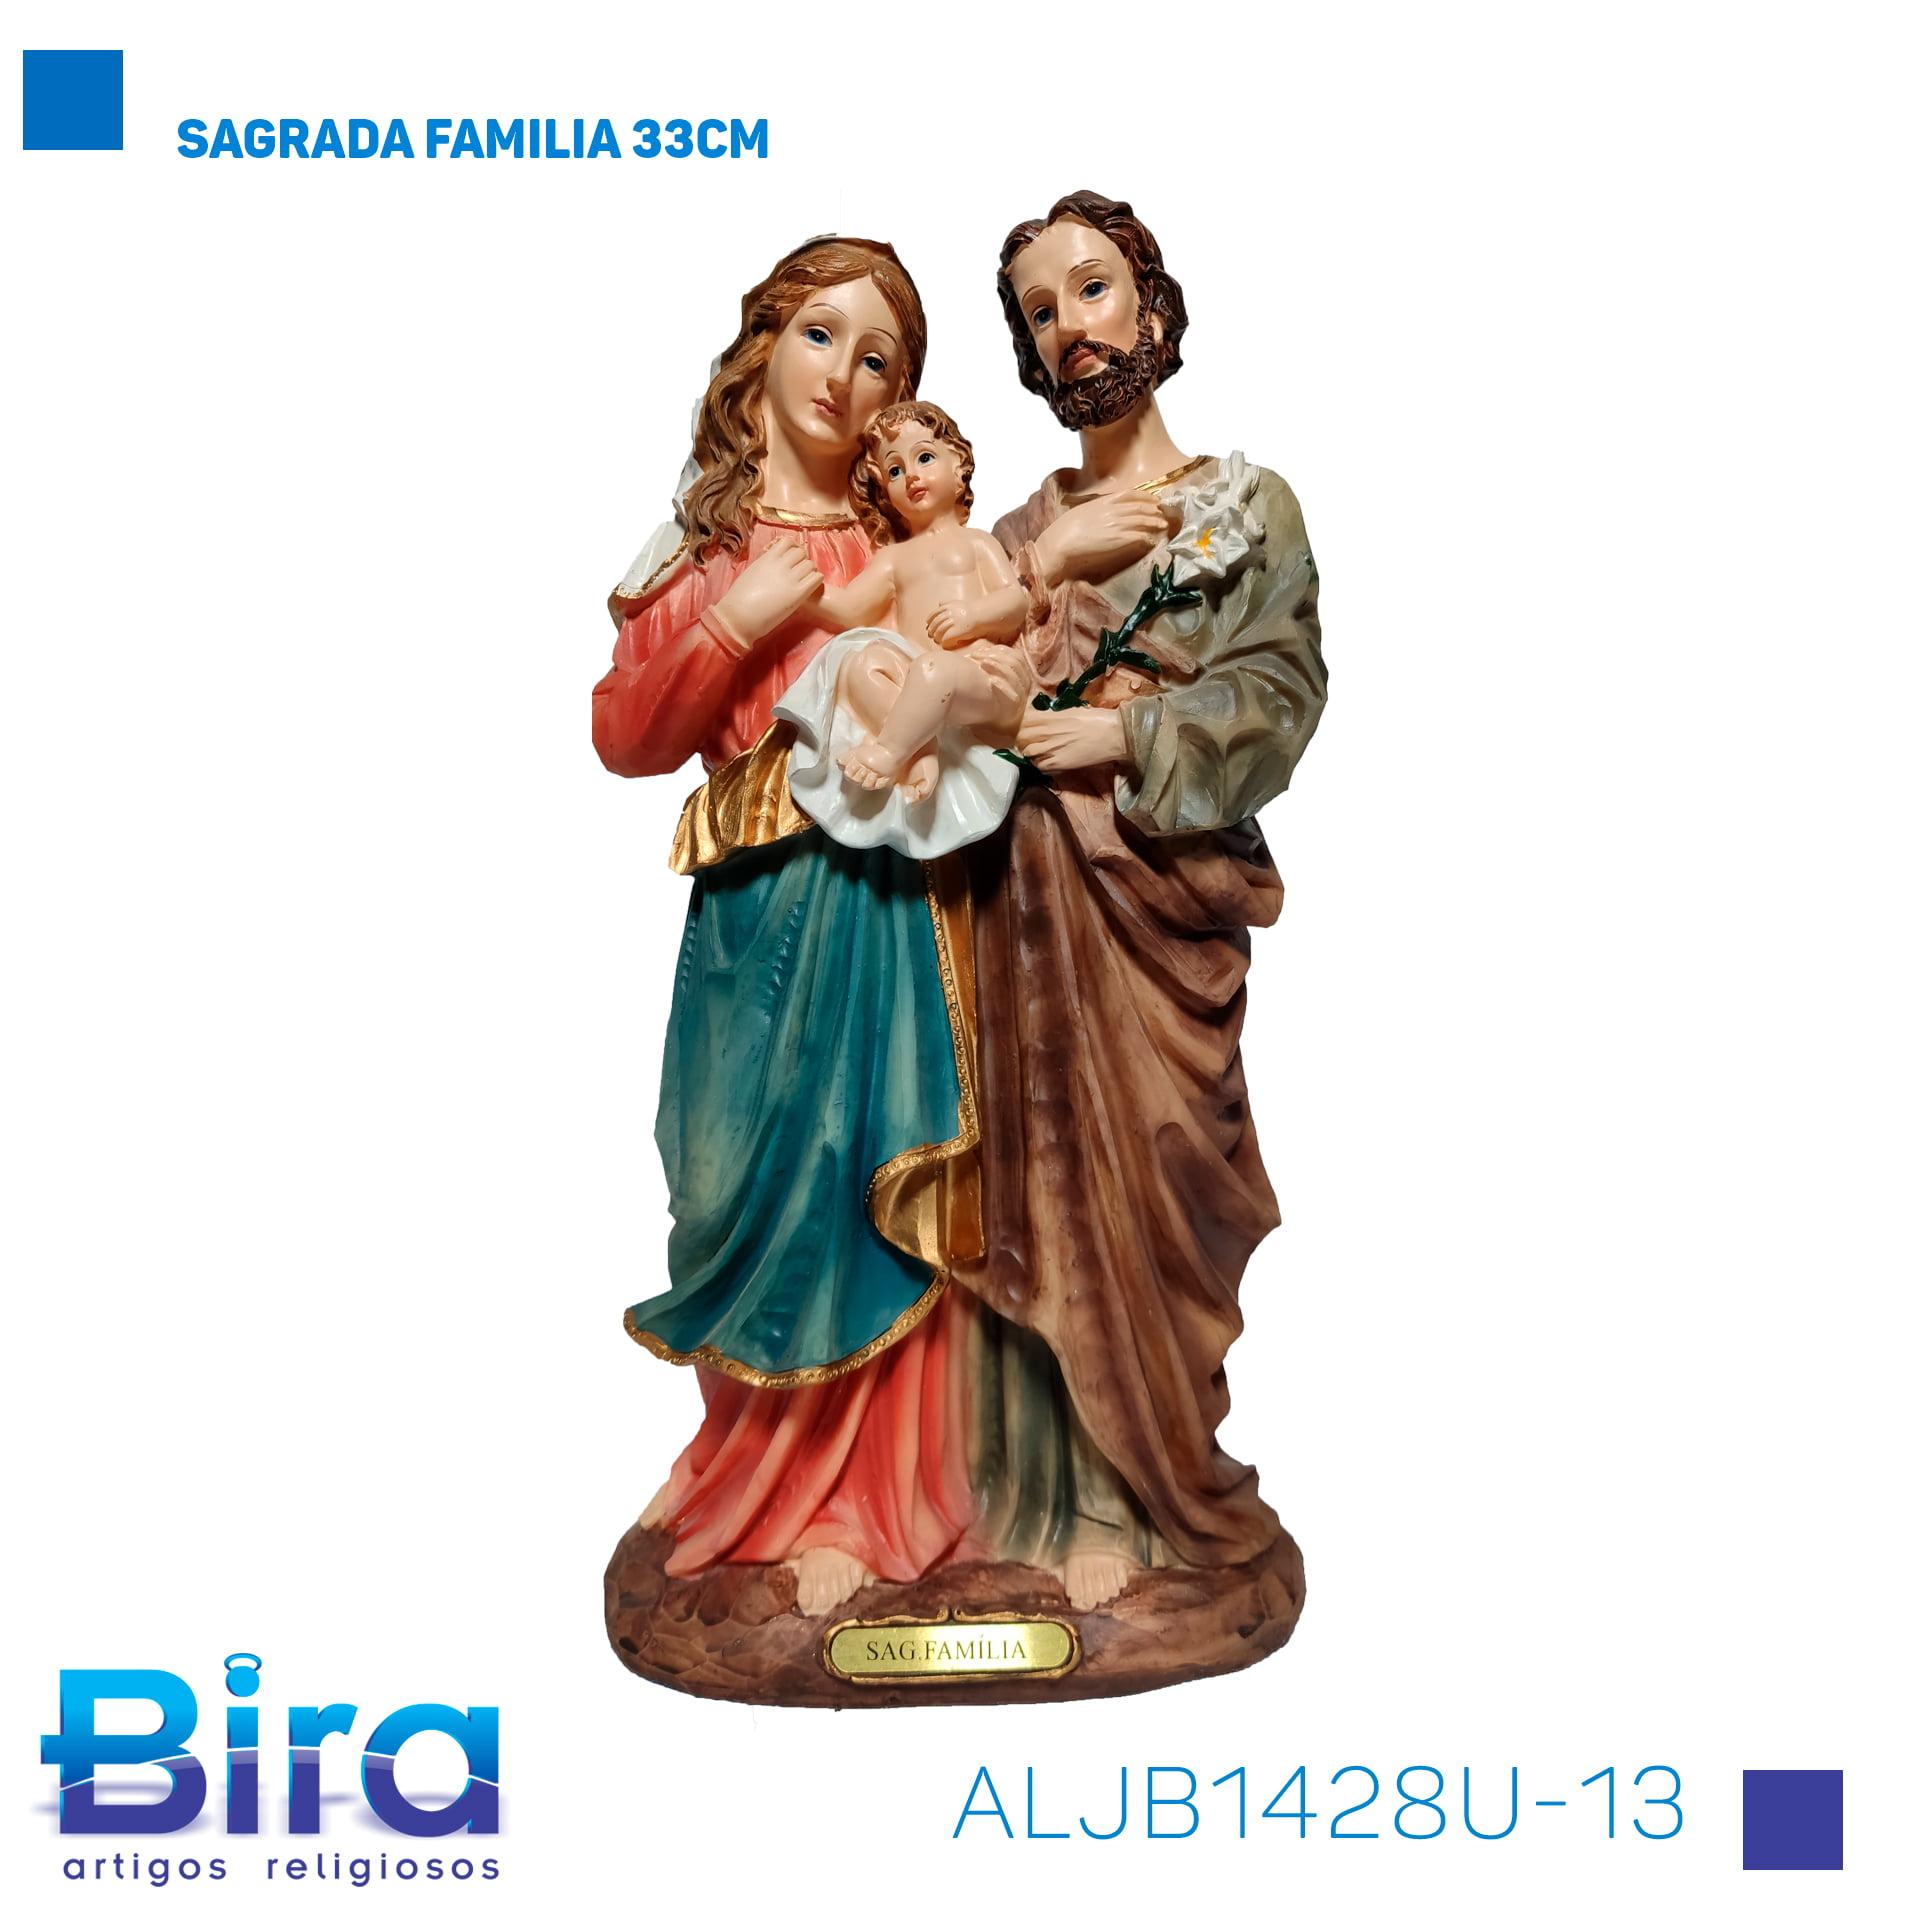 Bira Artigos Religiosos - SAGRADA FAMILIA 33CM Cód. ALJB1428U-13